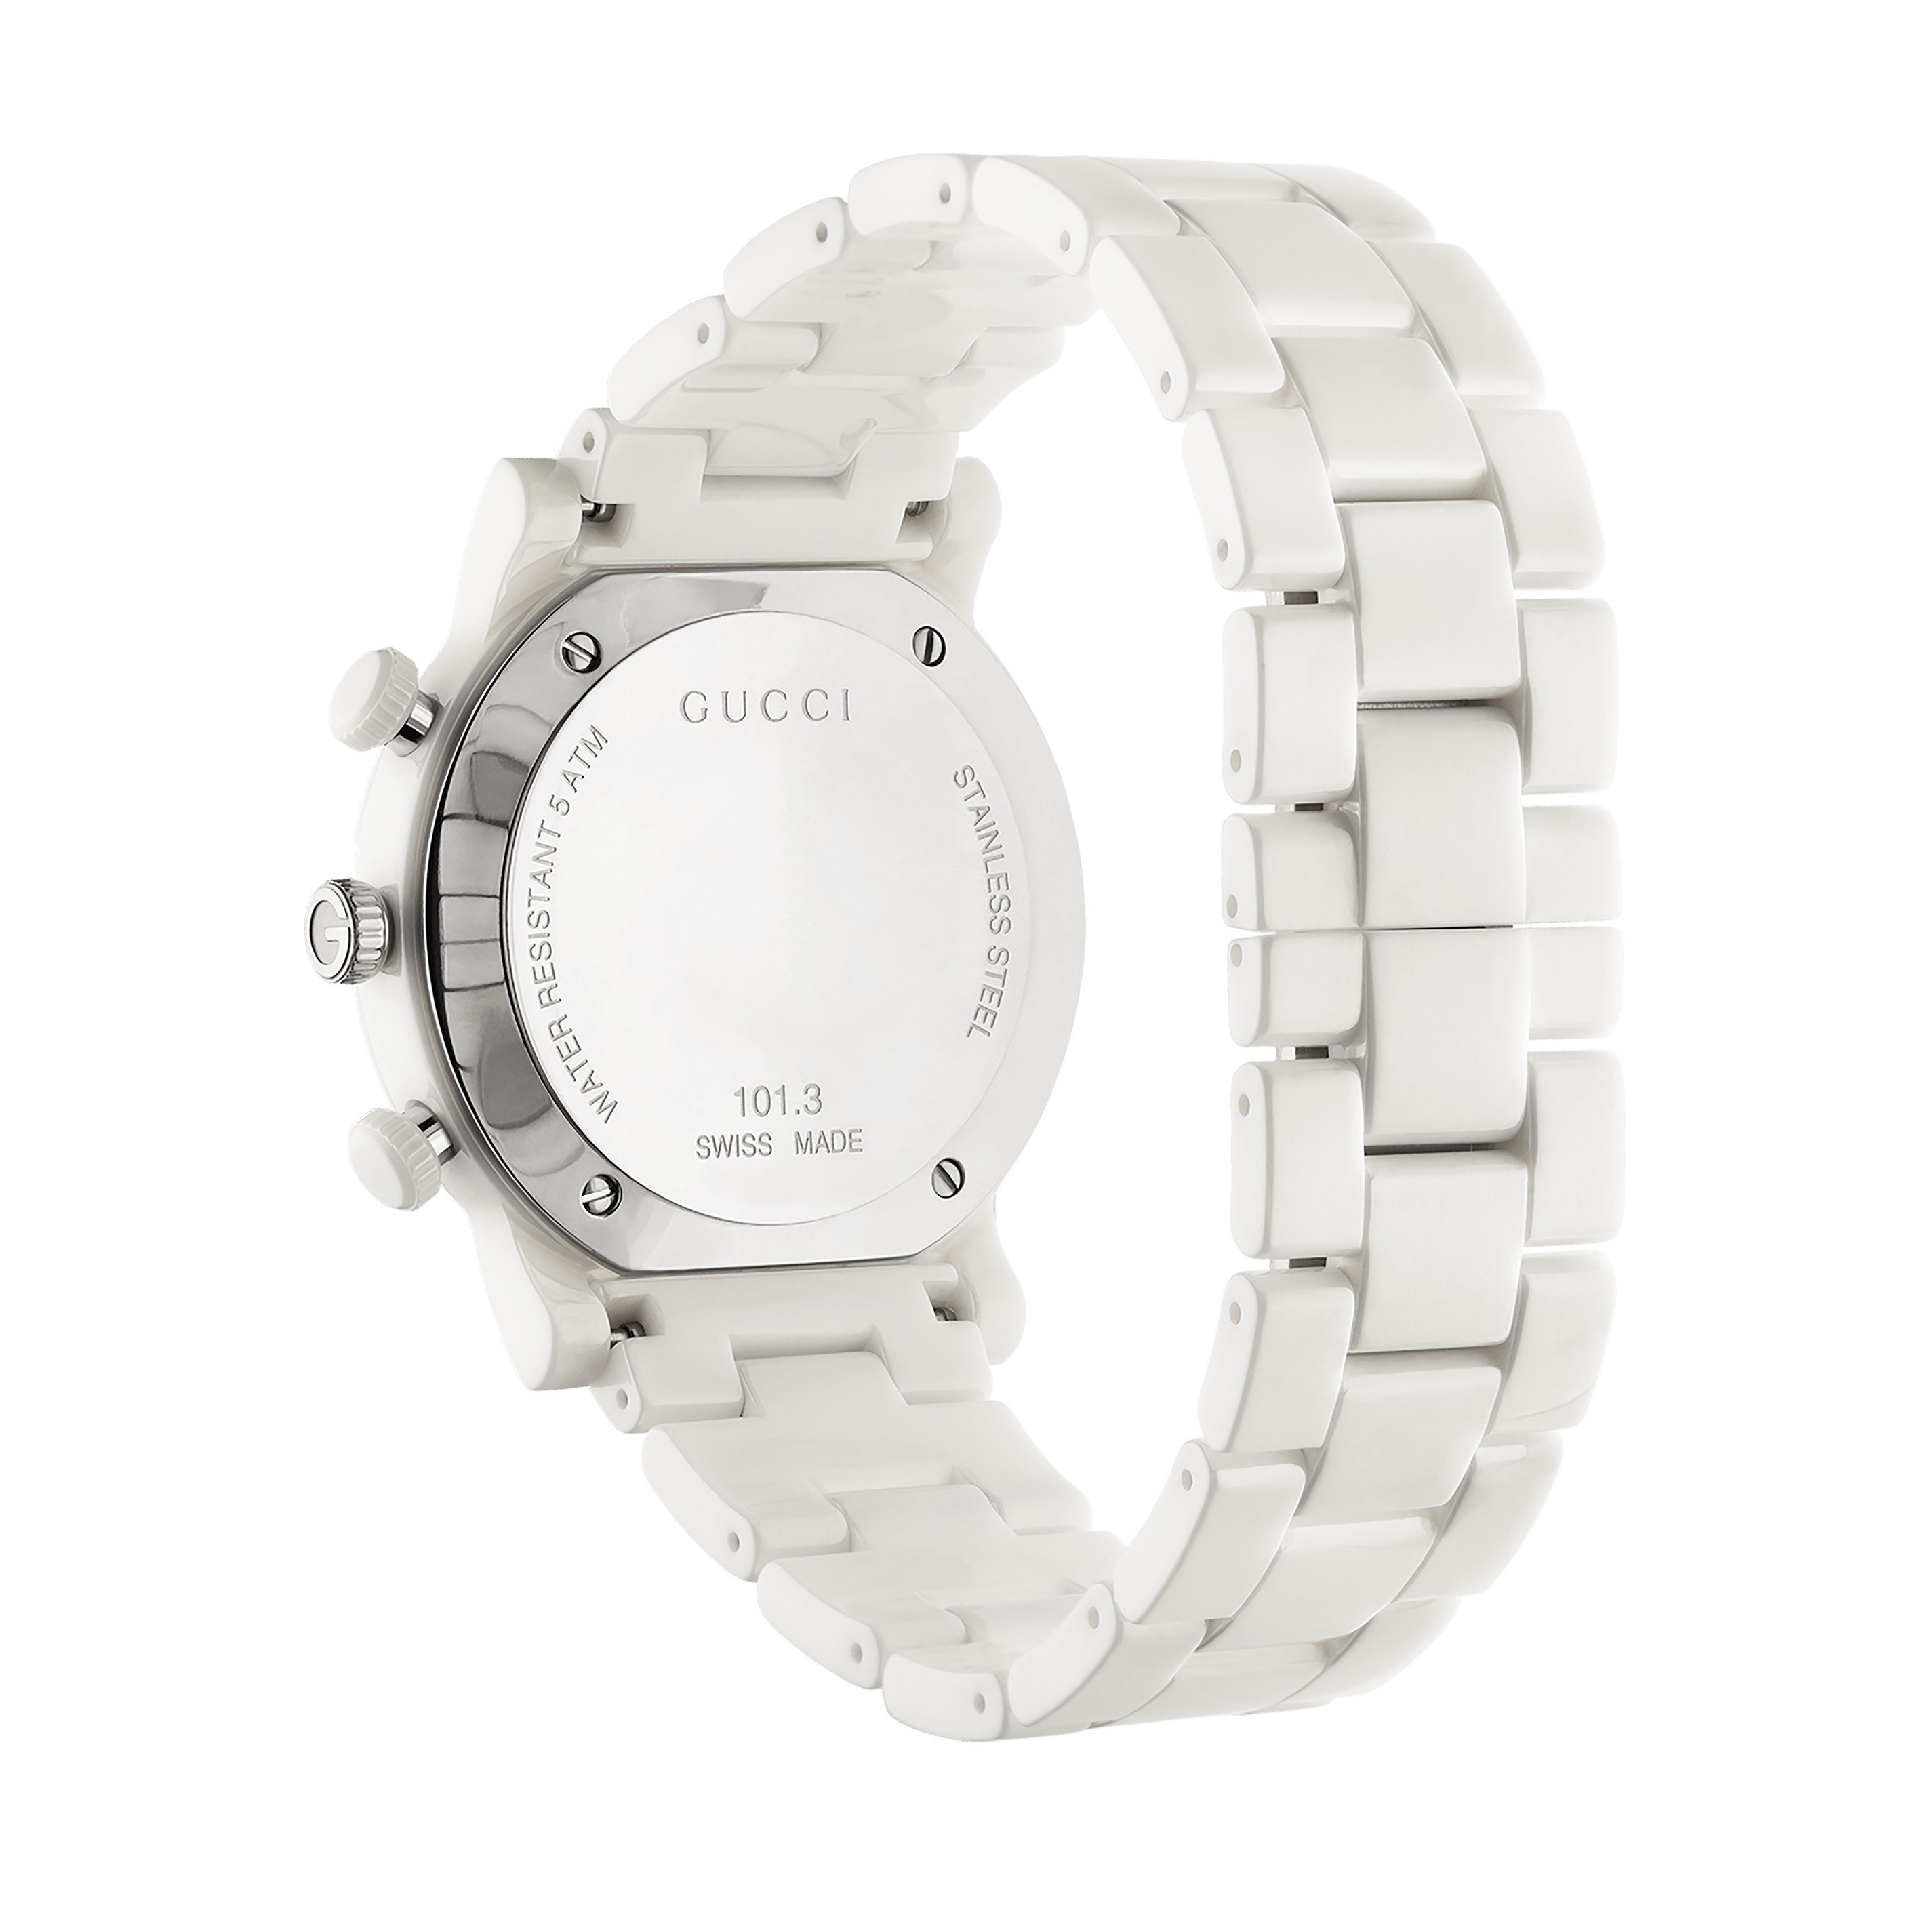 79b8f7d065b ... Man watch woman chronograph GUCCI G-CHRONO white ceramic 38mm YA101353  ...